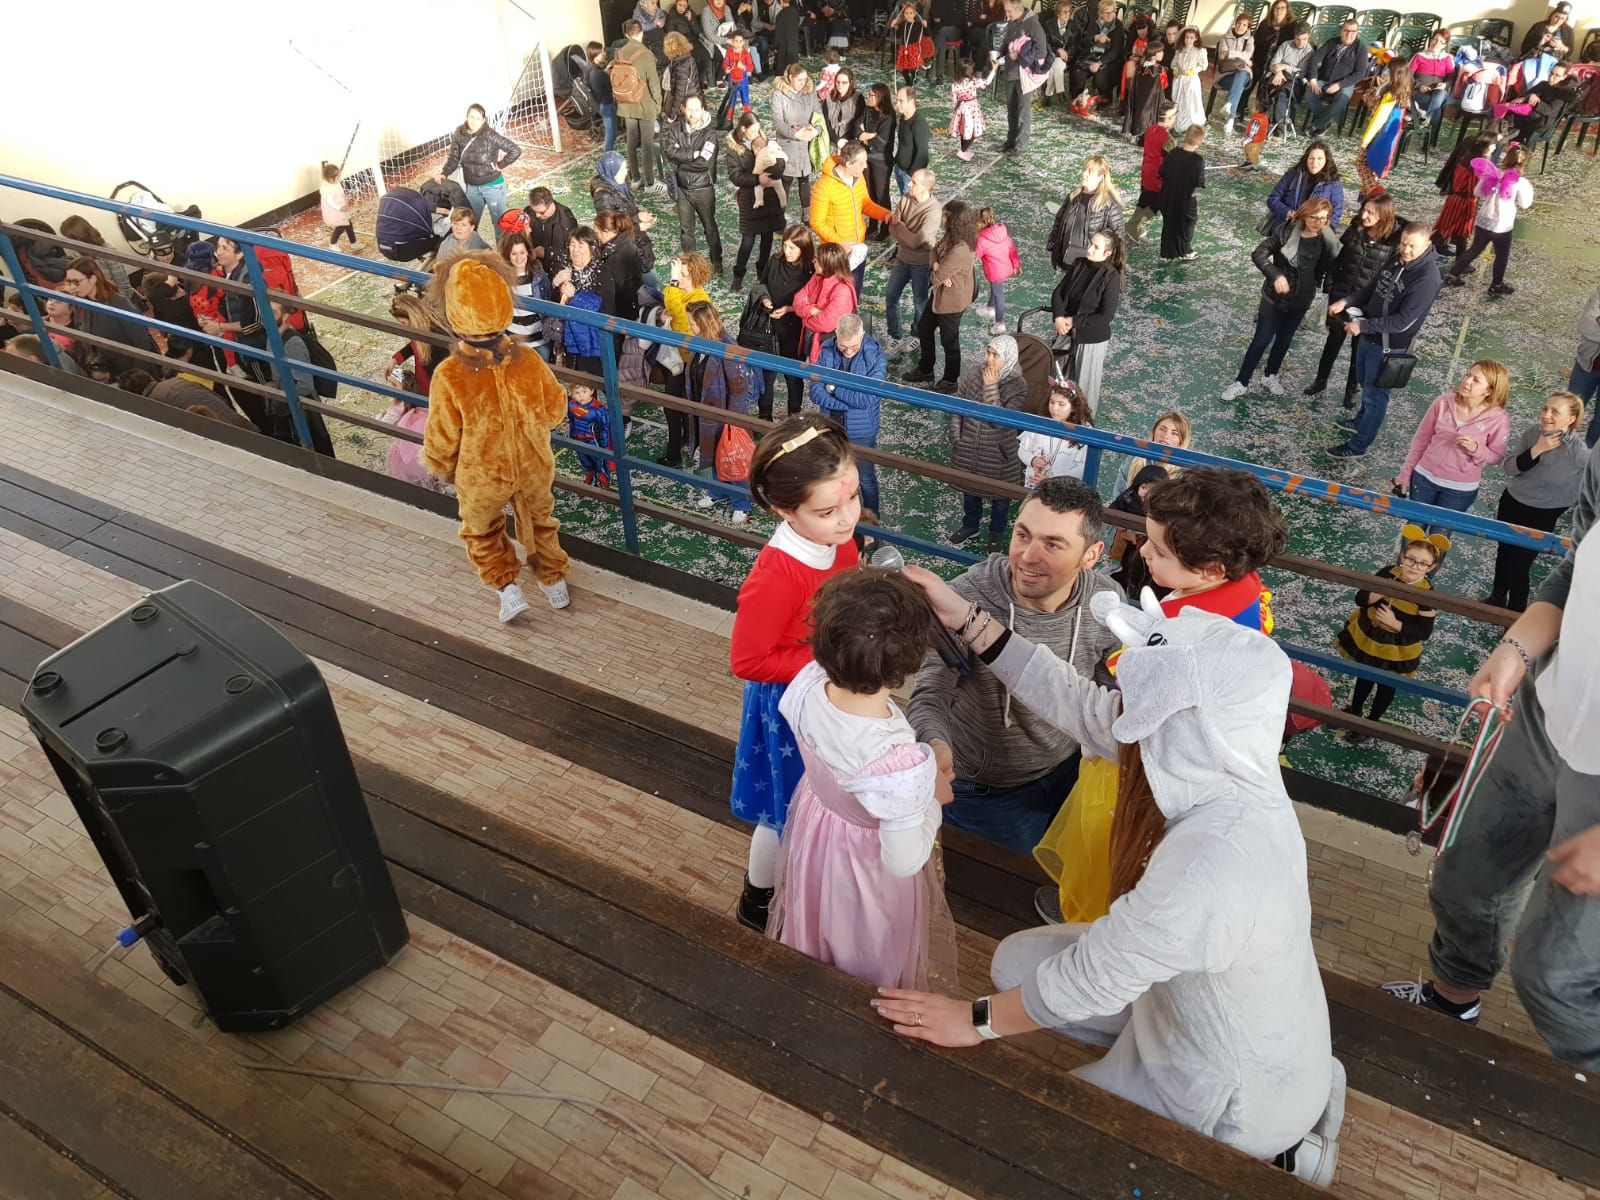 Baraonda Carnevale 2019 (206)